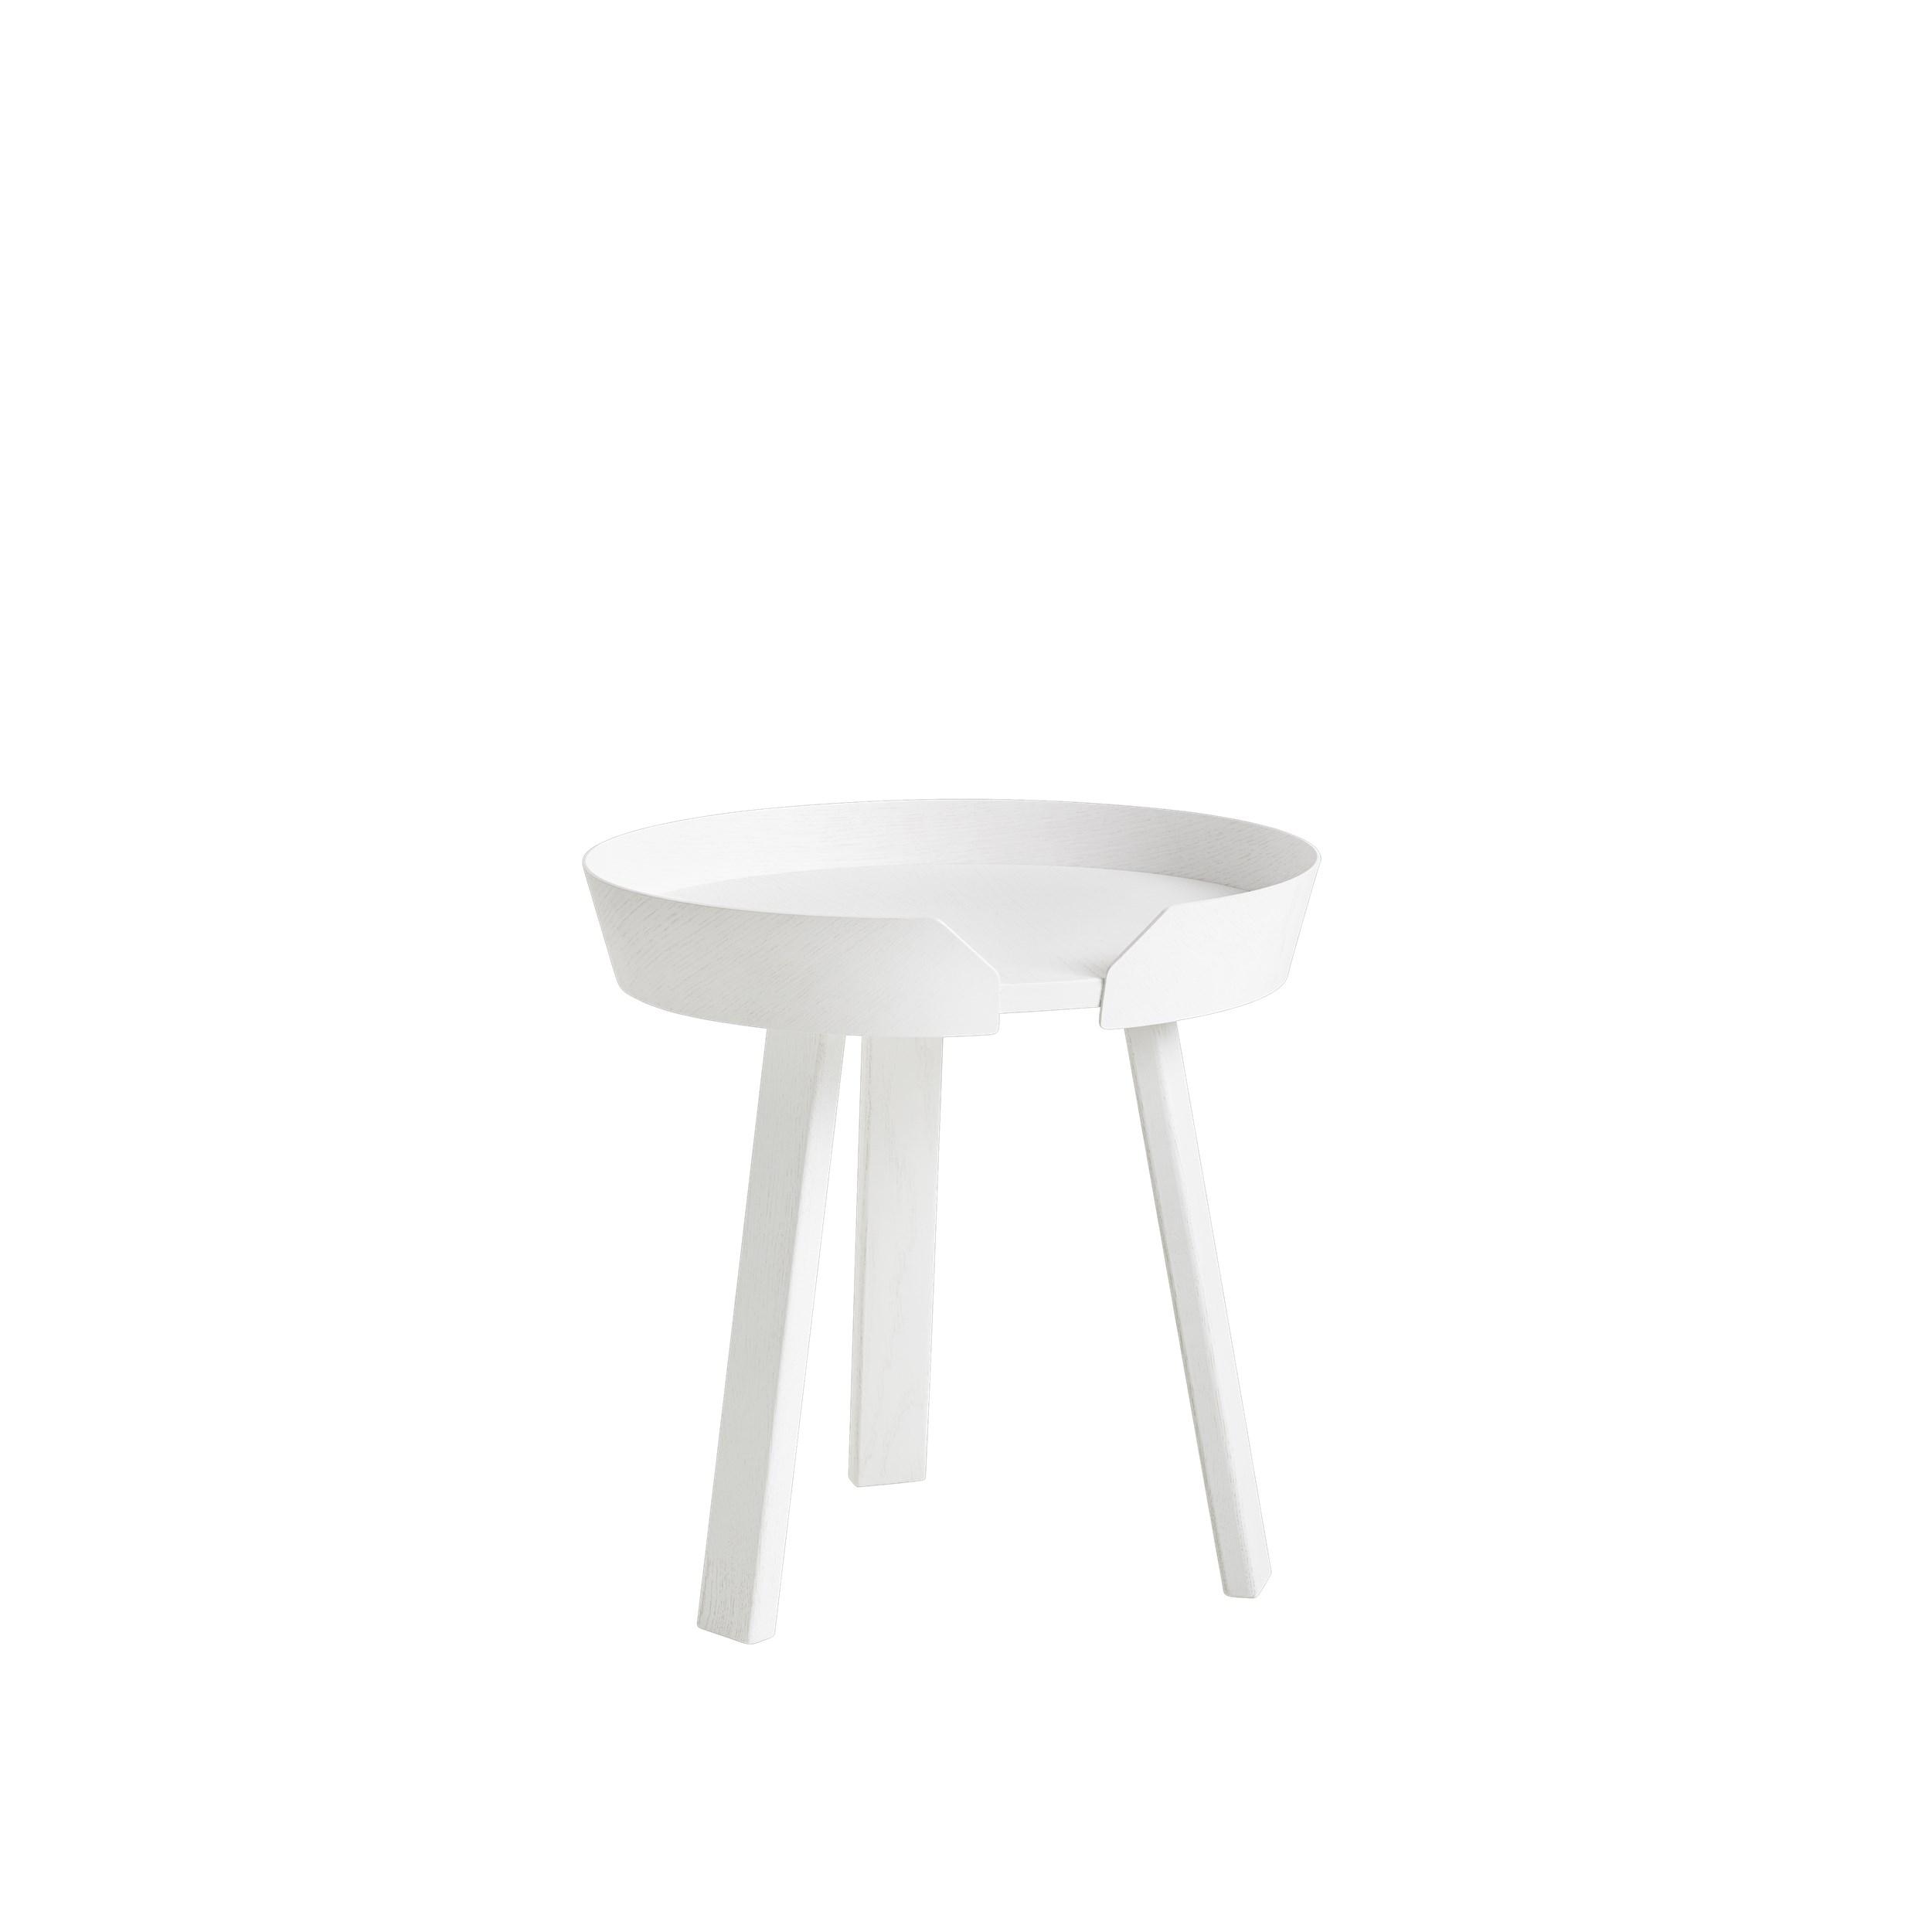 Around coffee table small white